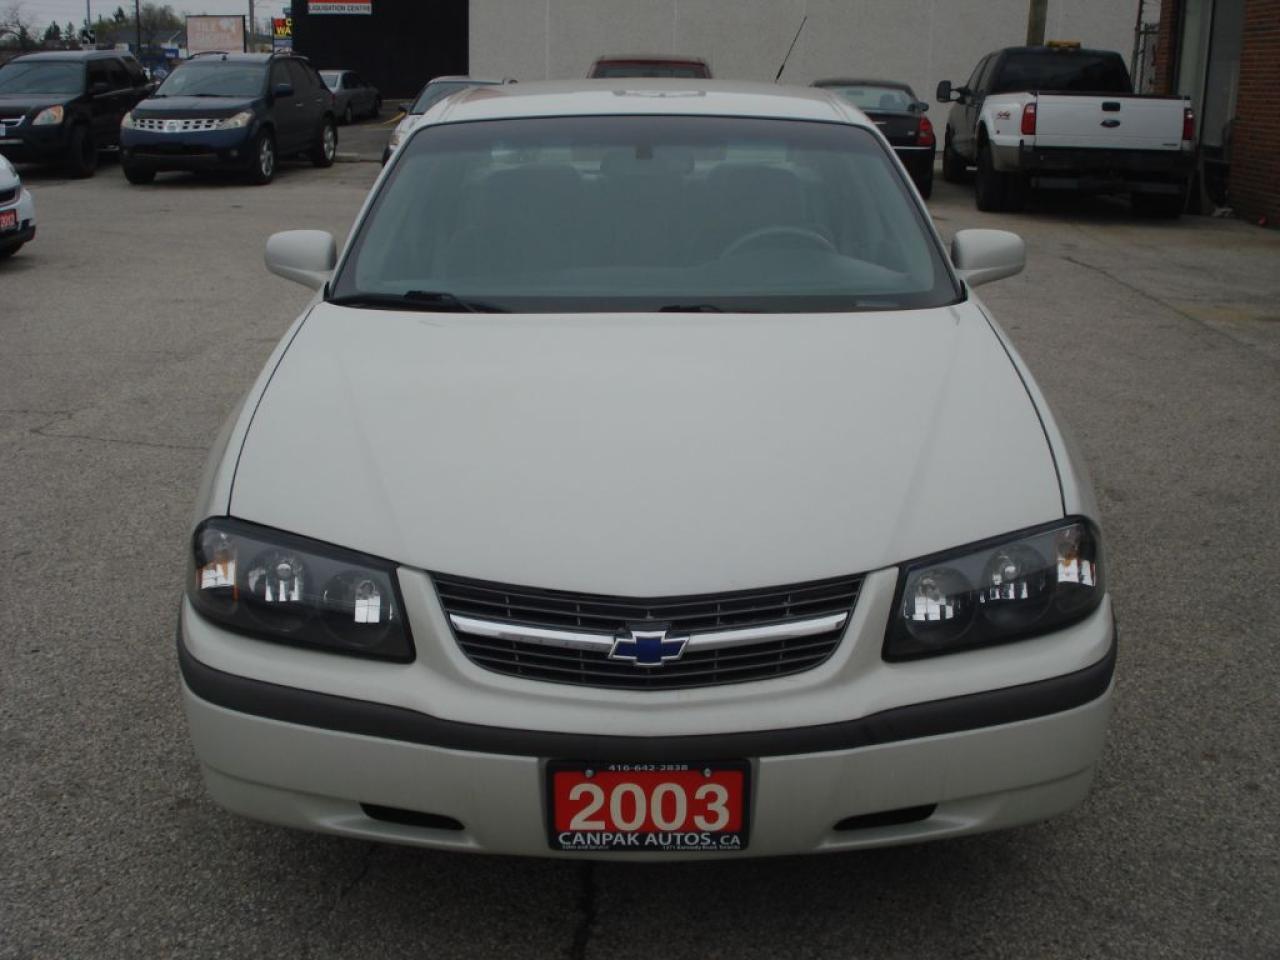 Photo of White 2003 Chevrolet Impala